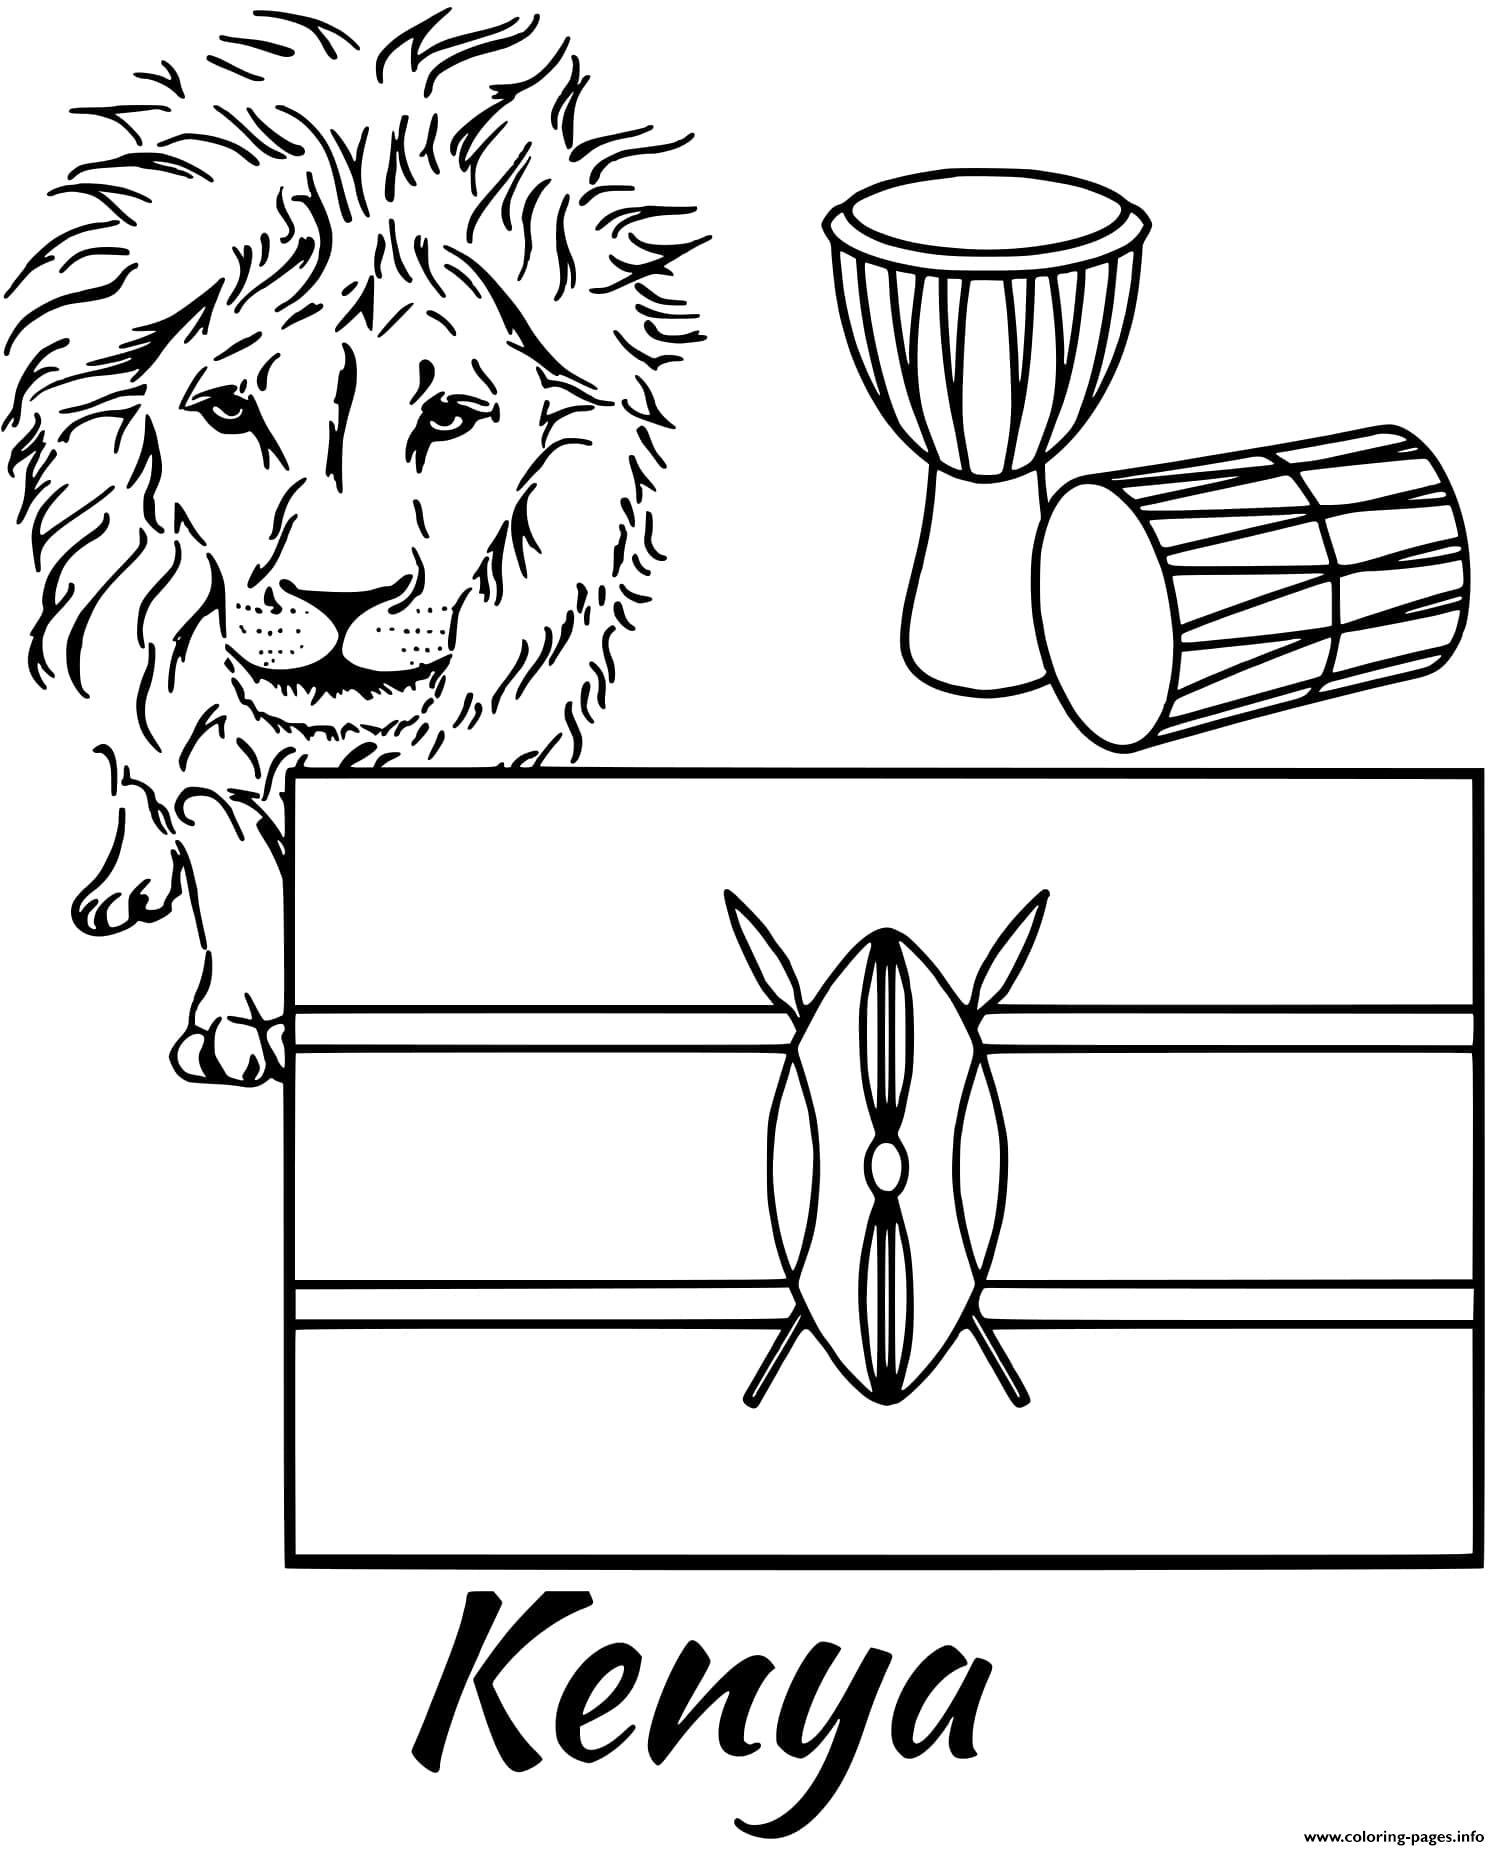 Kenya Flag Coloring Page